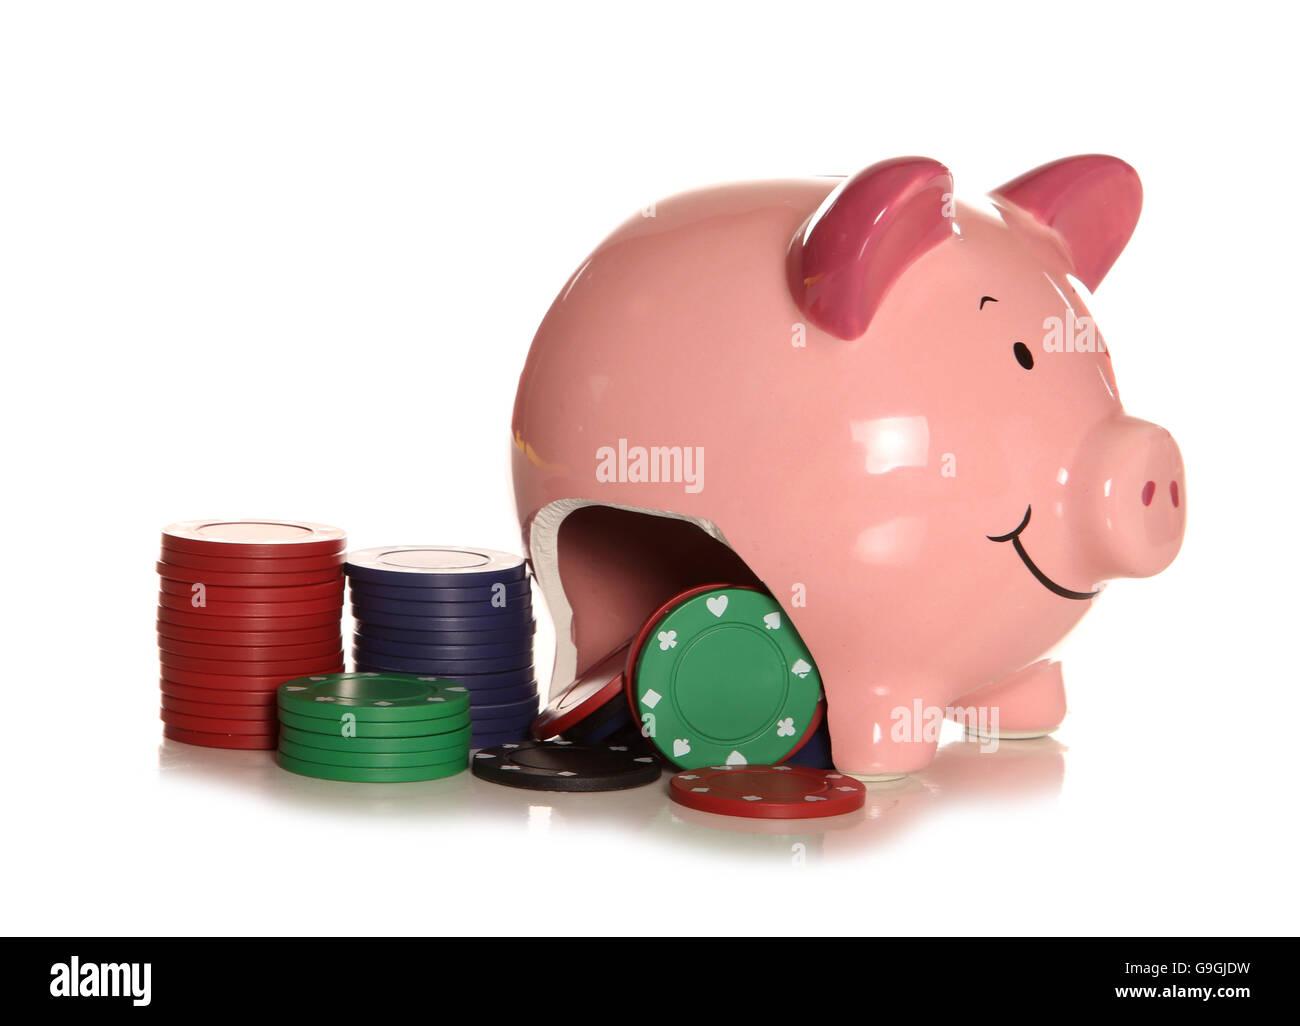 Spending your savings on gambling piggybank cutout - Stock Image